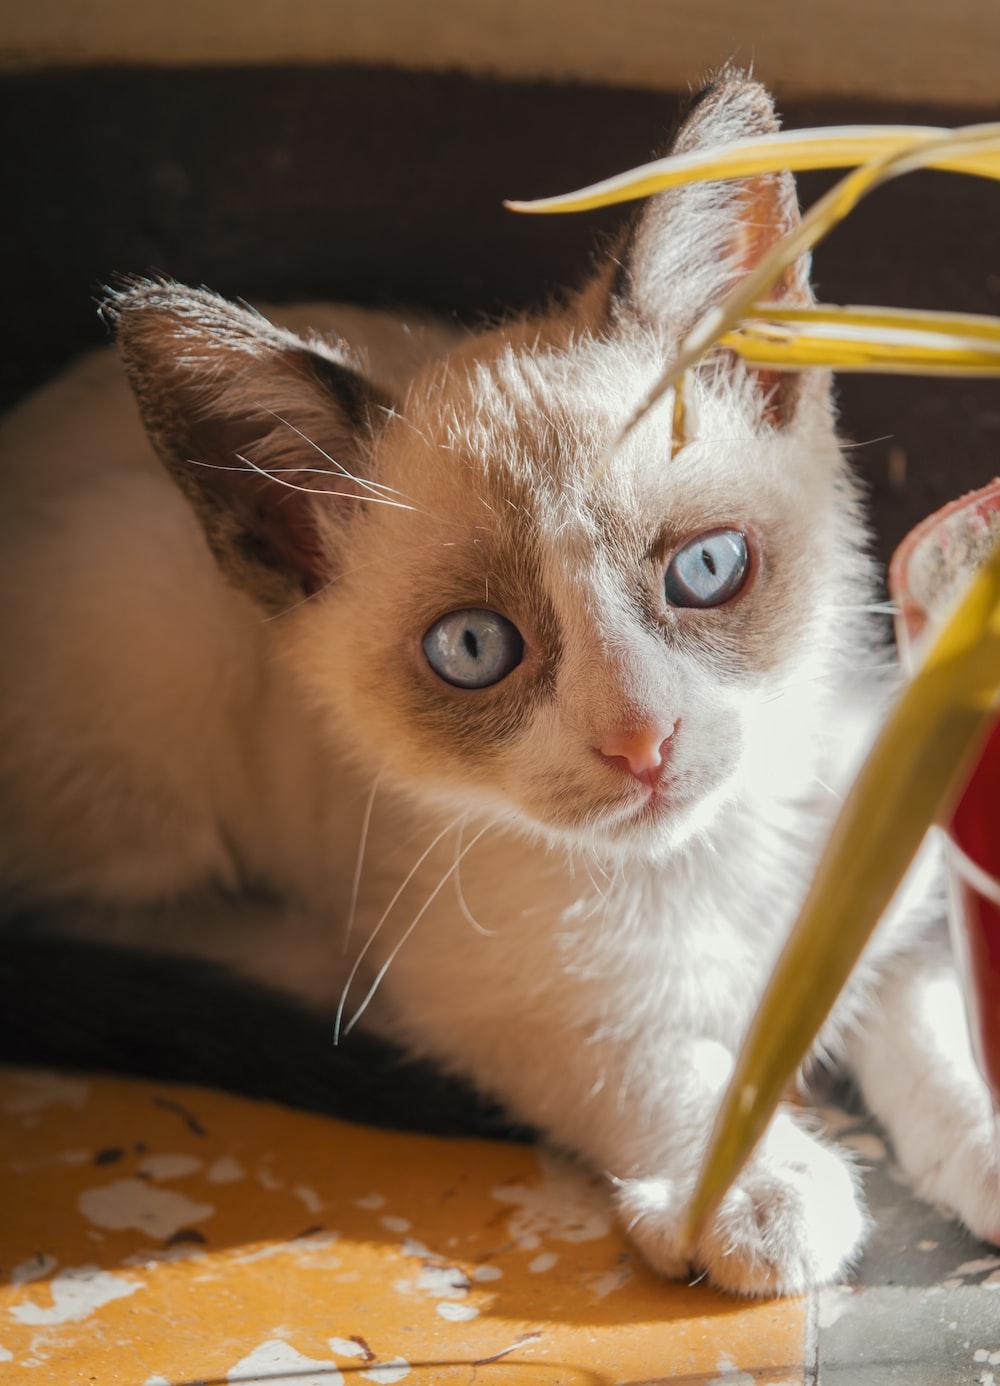 beige and grey kitten